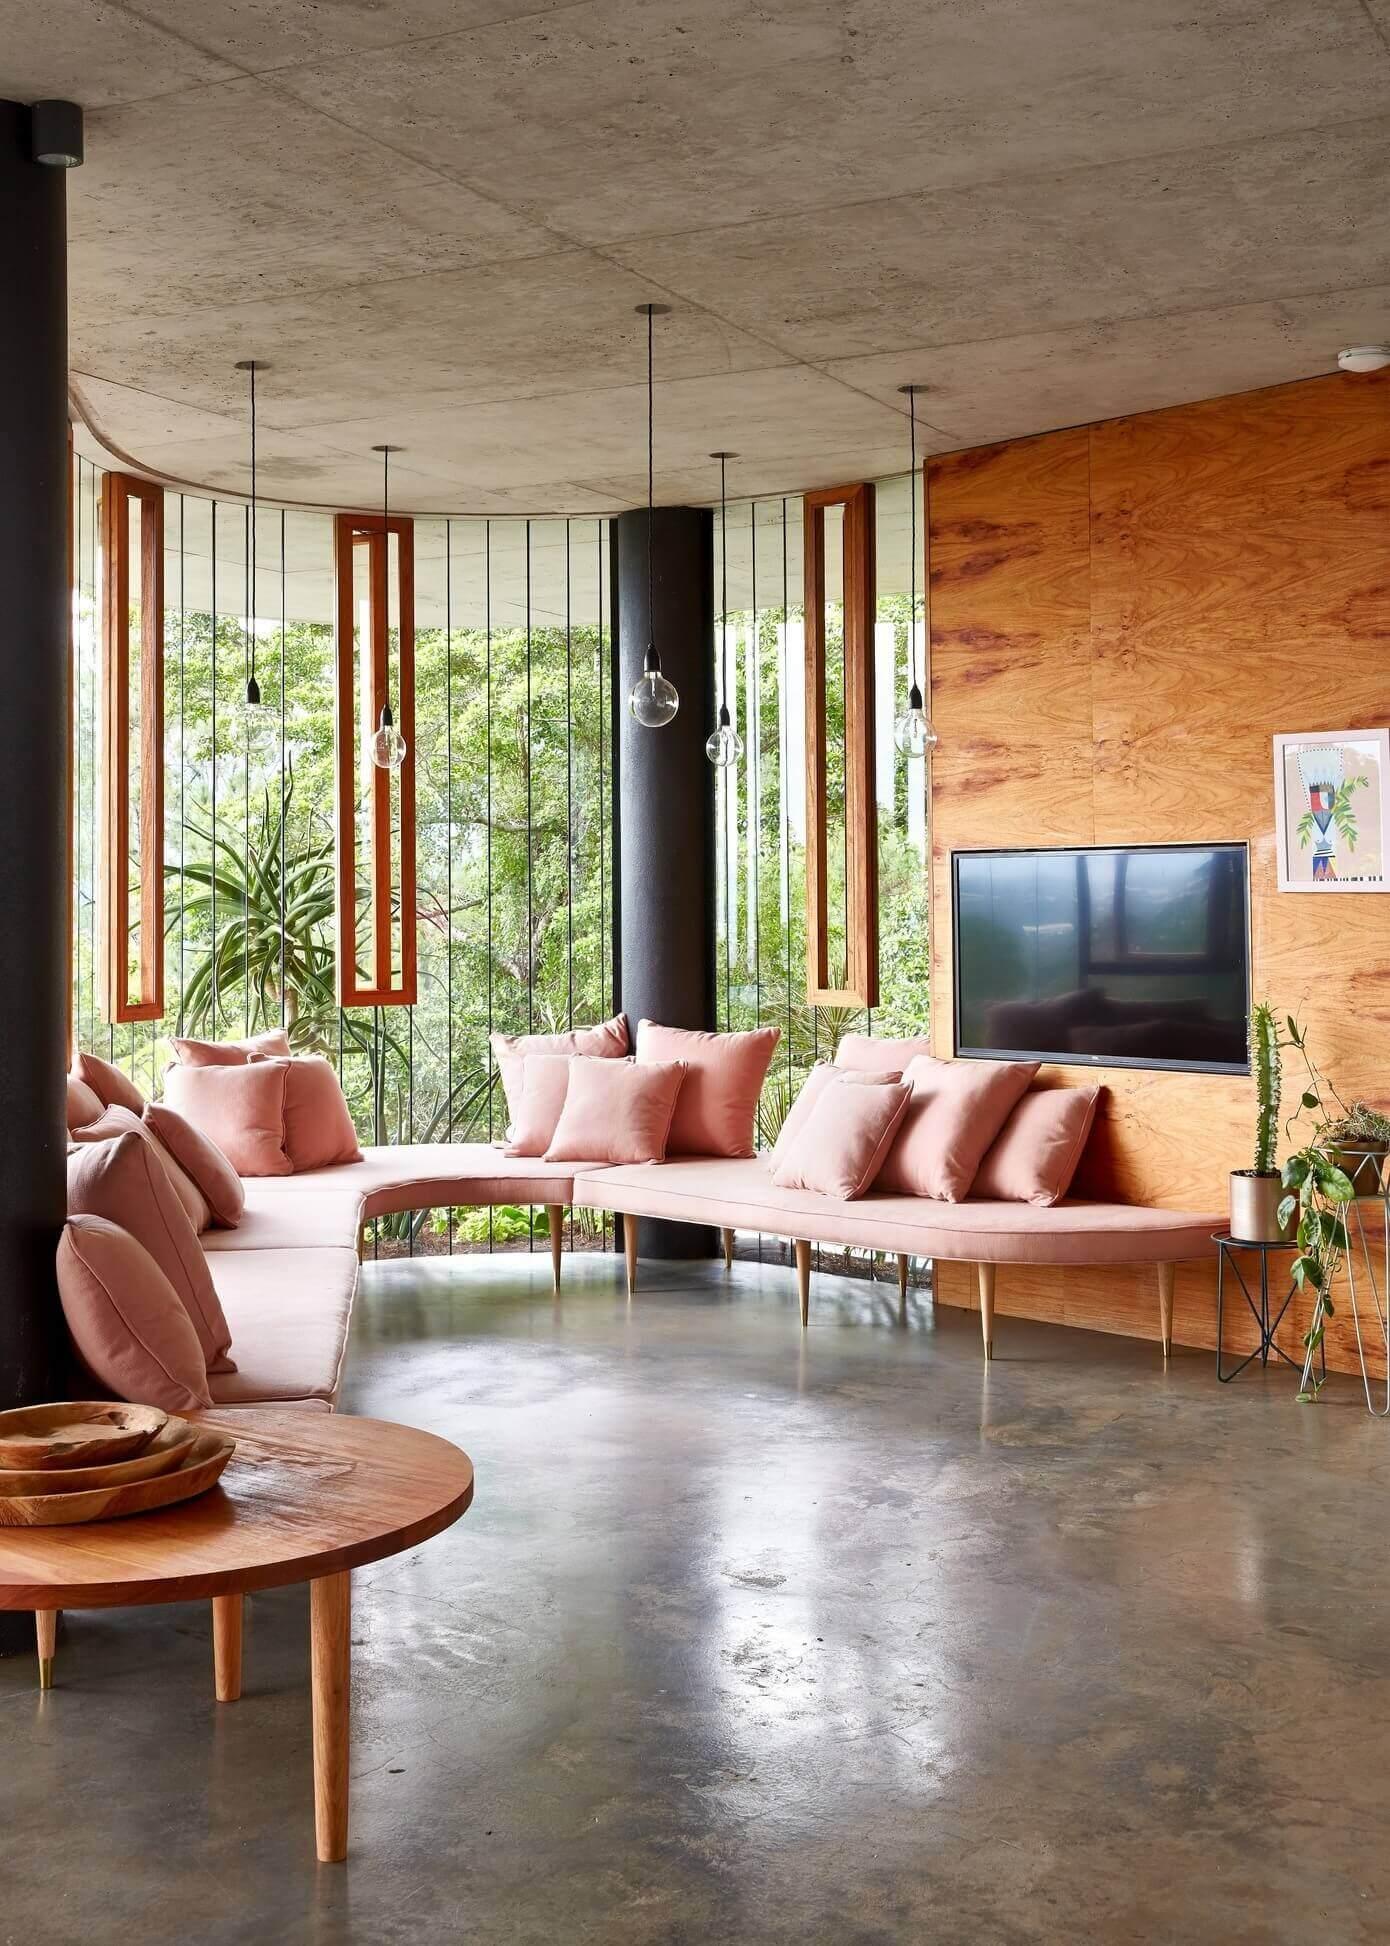 planchonella-house-jesse-bennett-architect-03